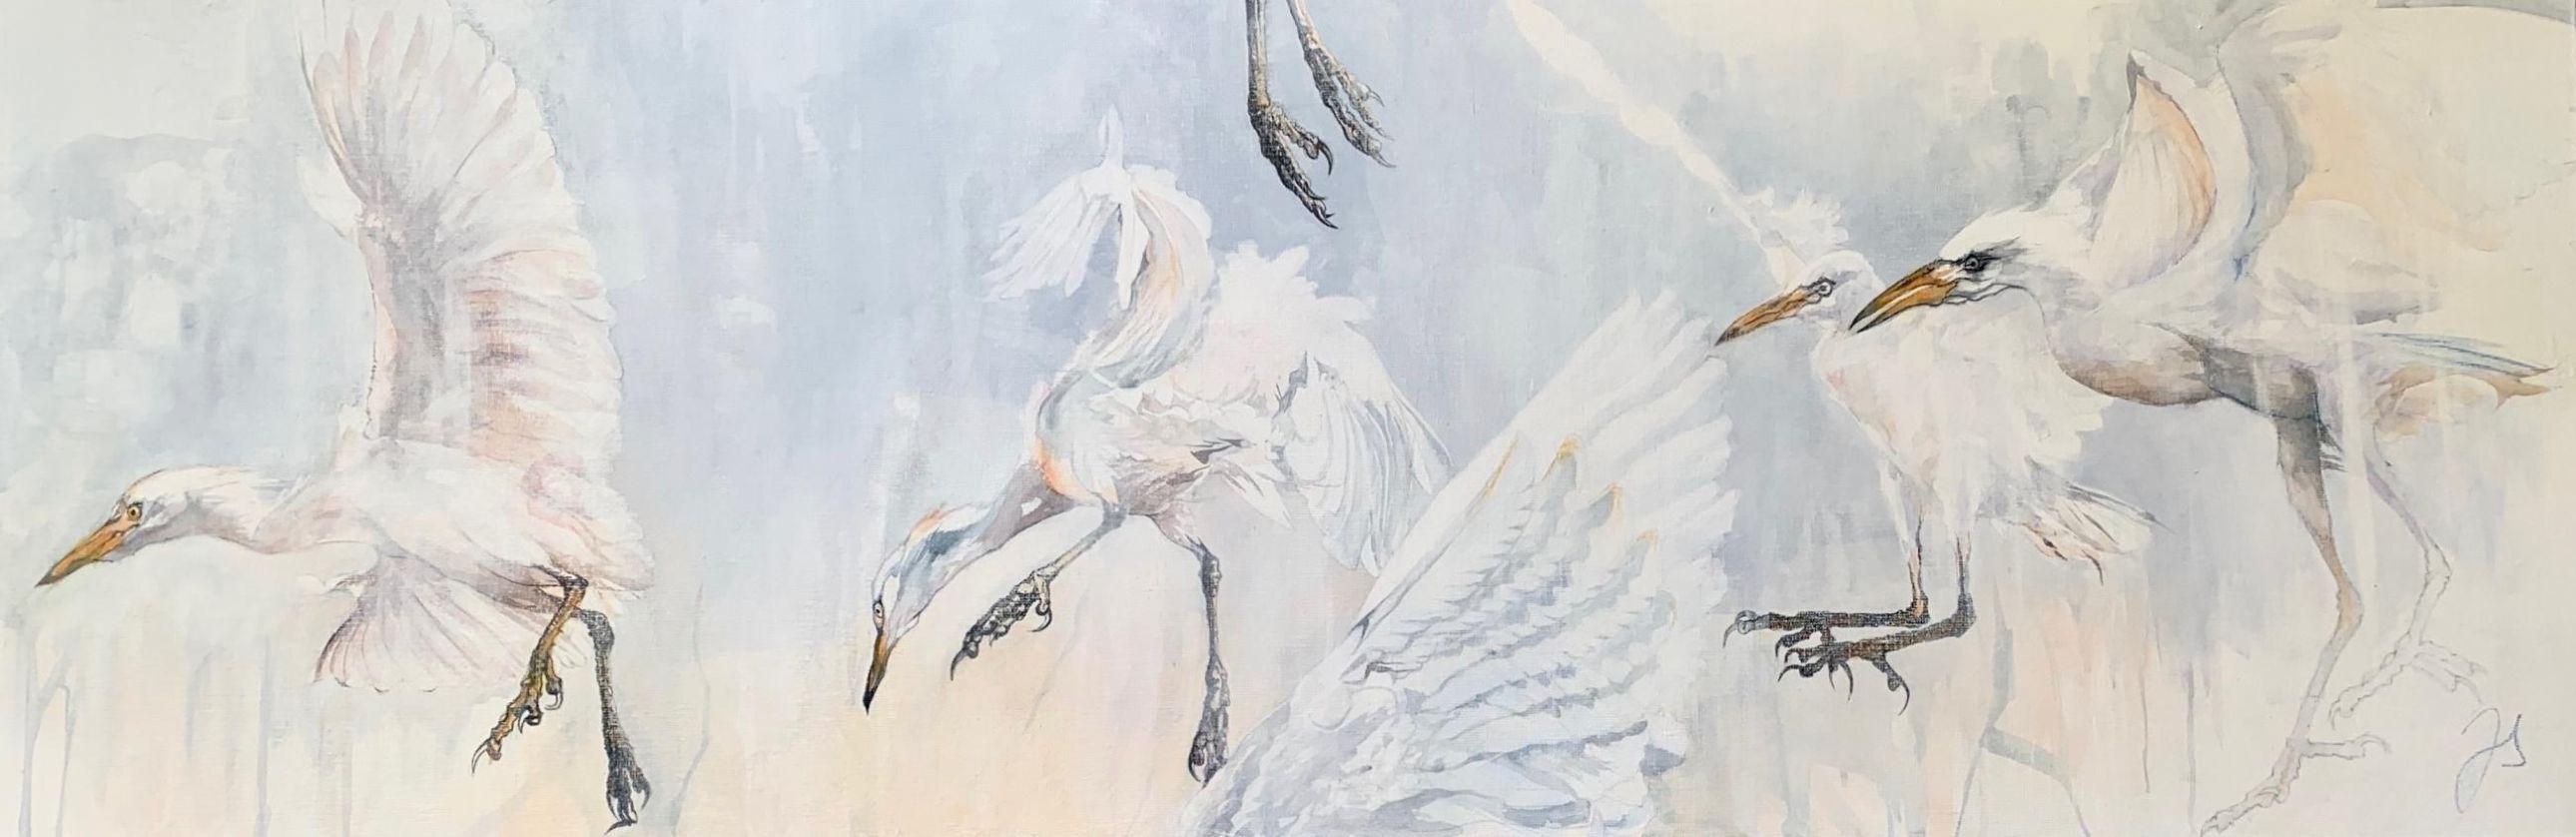 restless (herons garde bœufs) - 50-150 cm.jpg